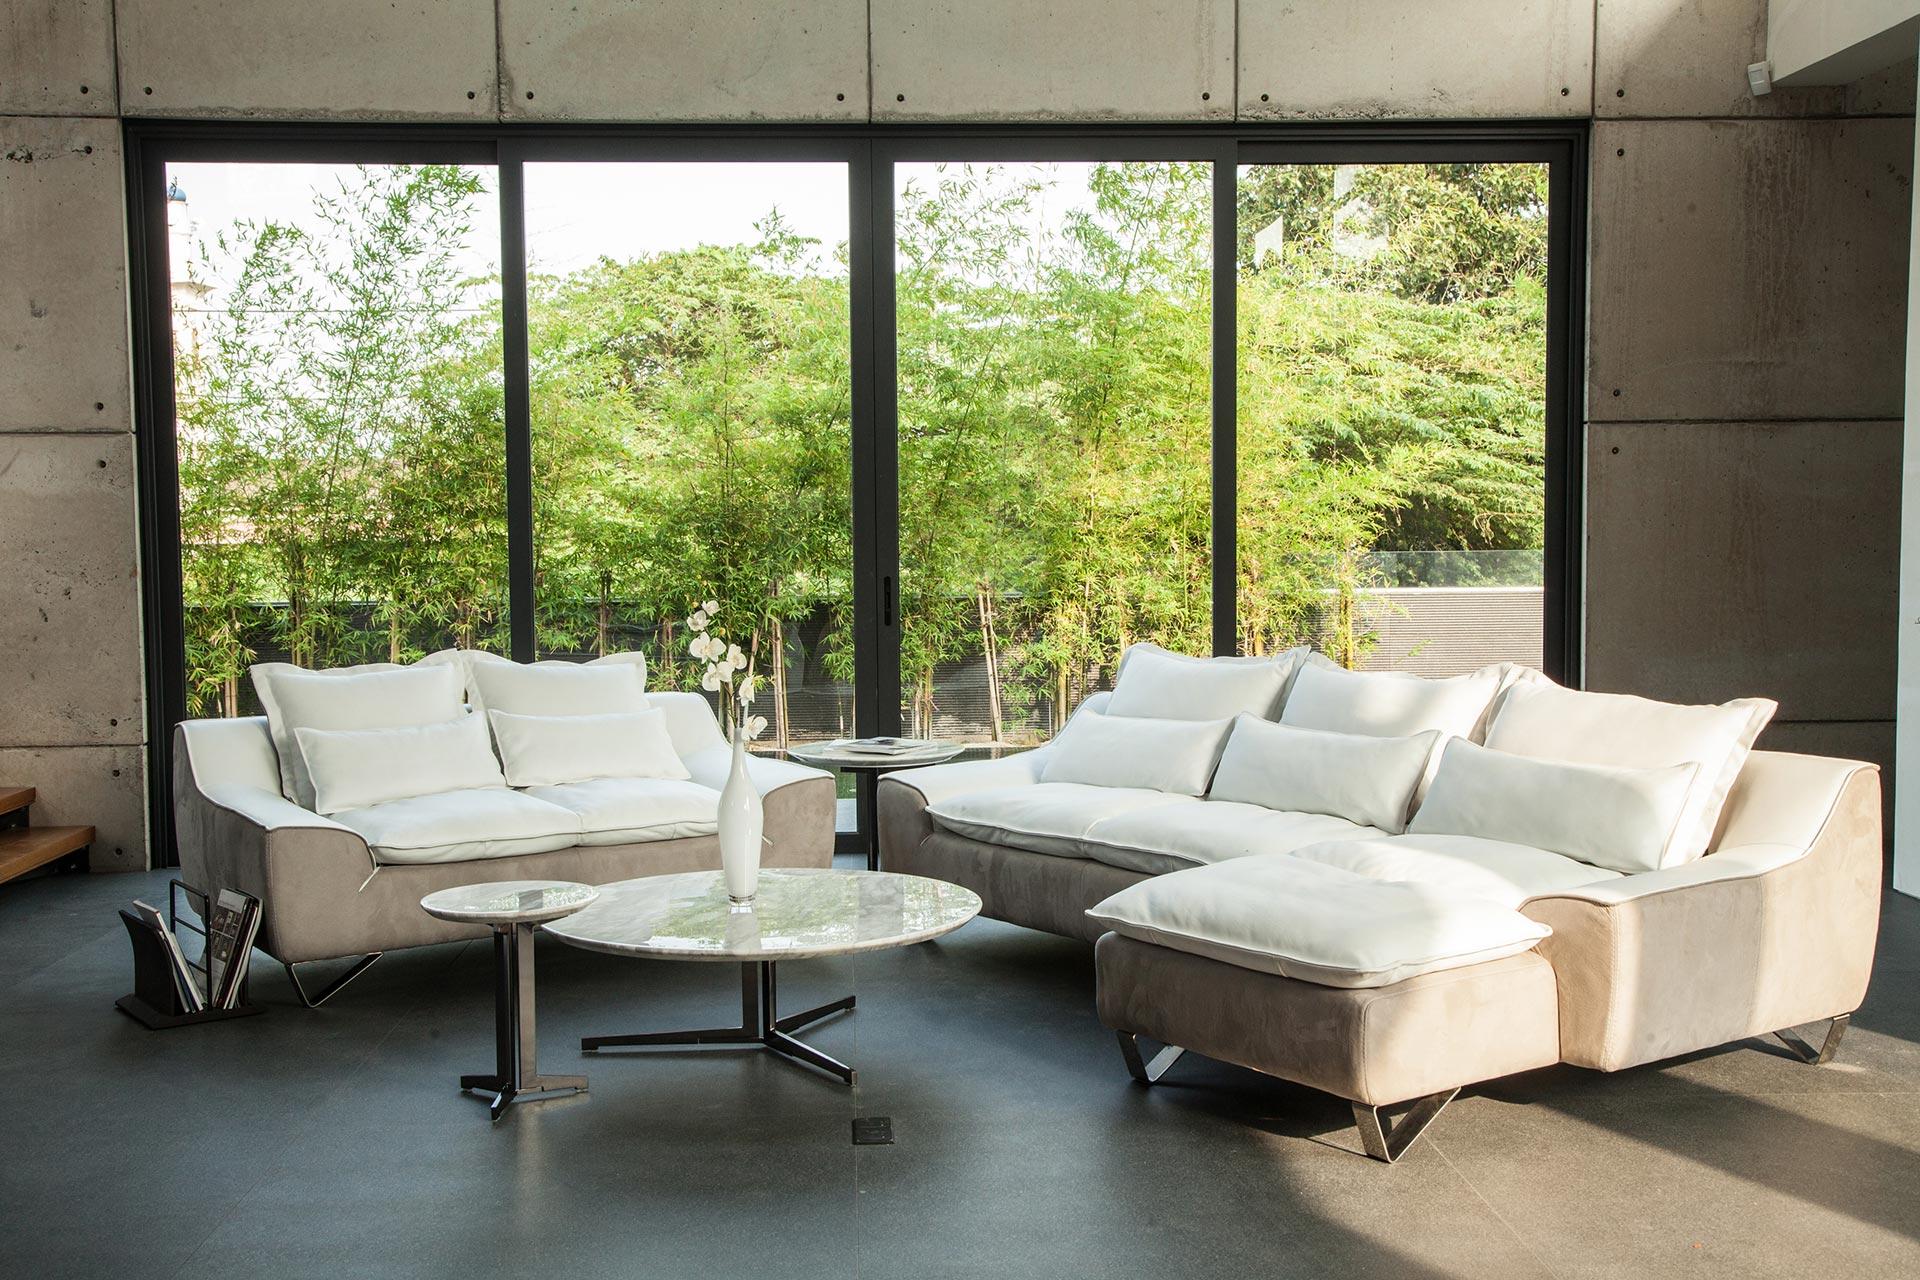 Crazy Sectional Sofa